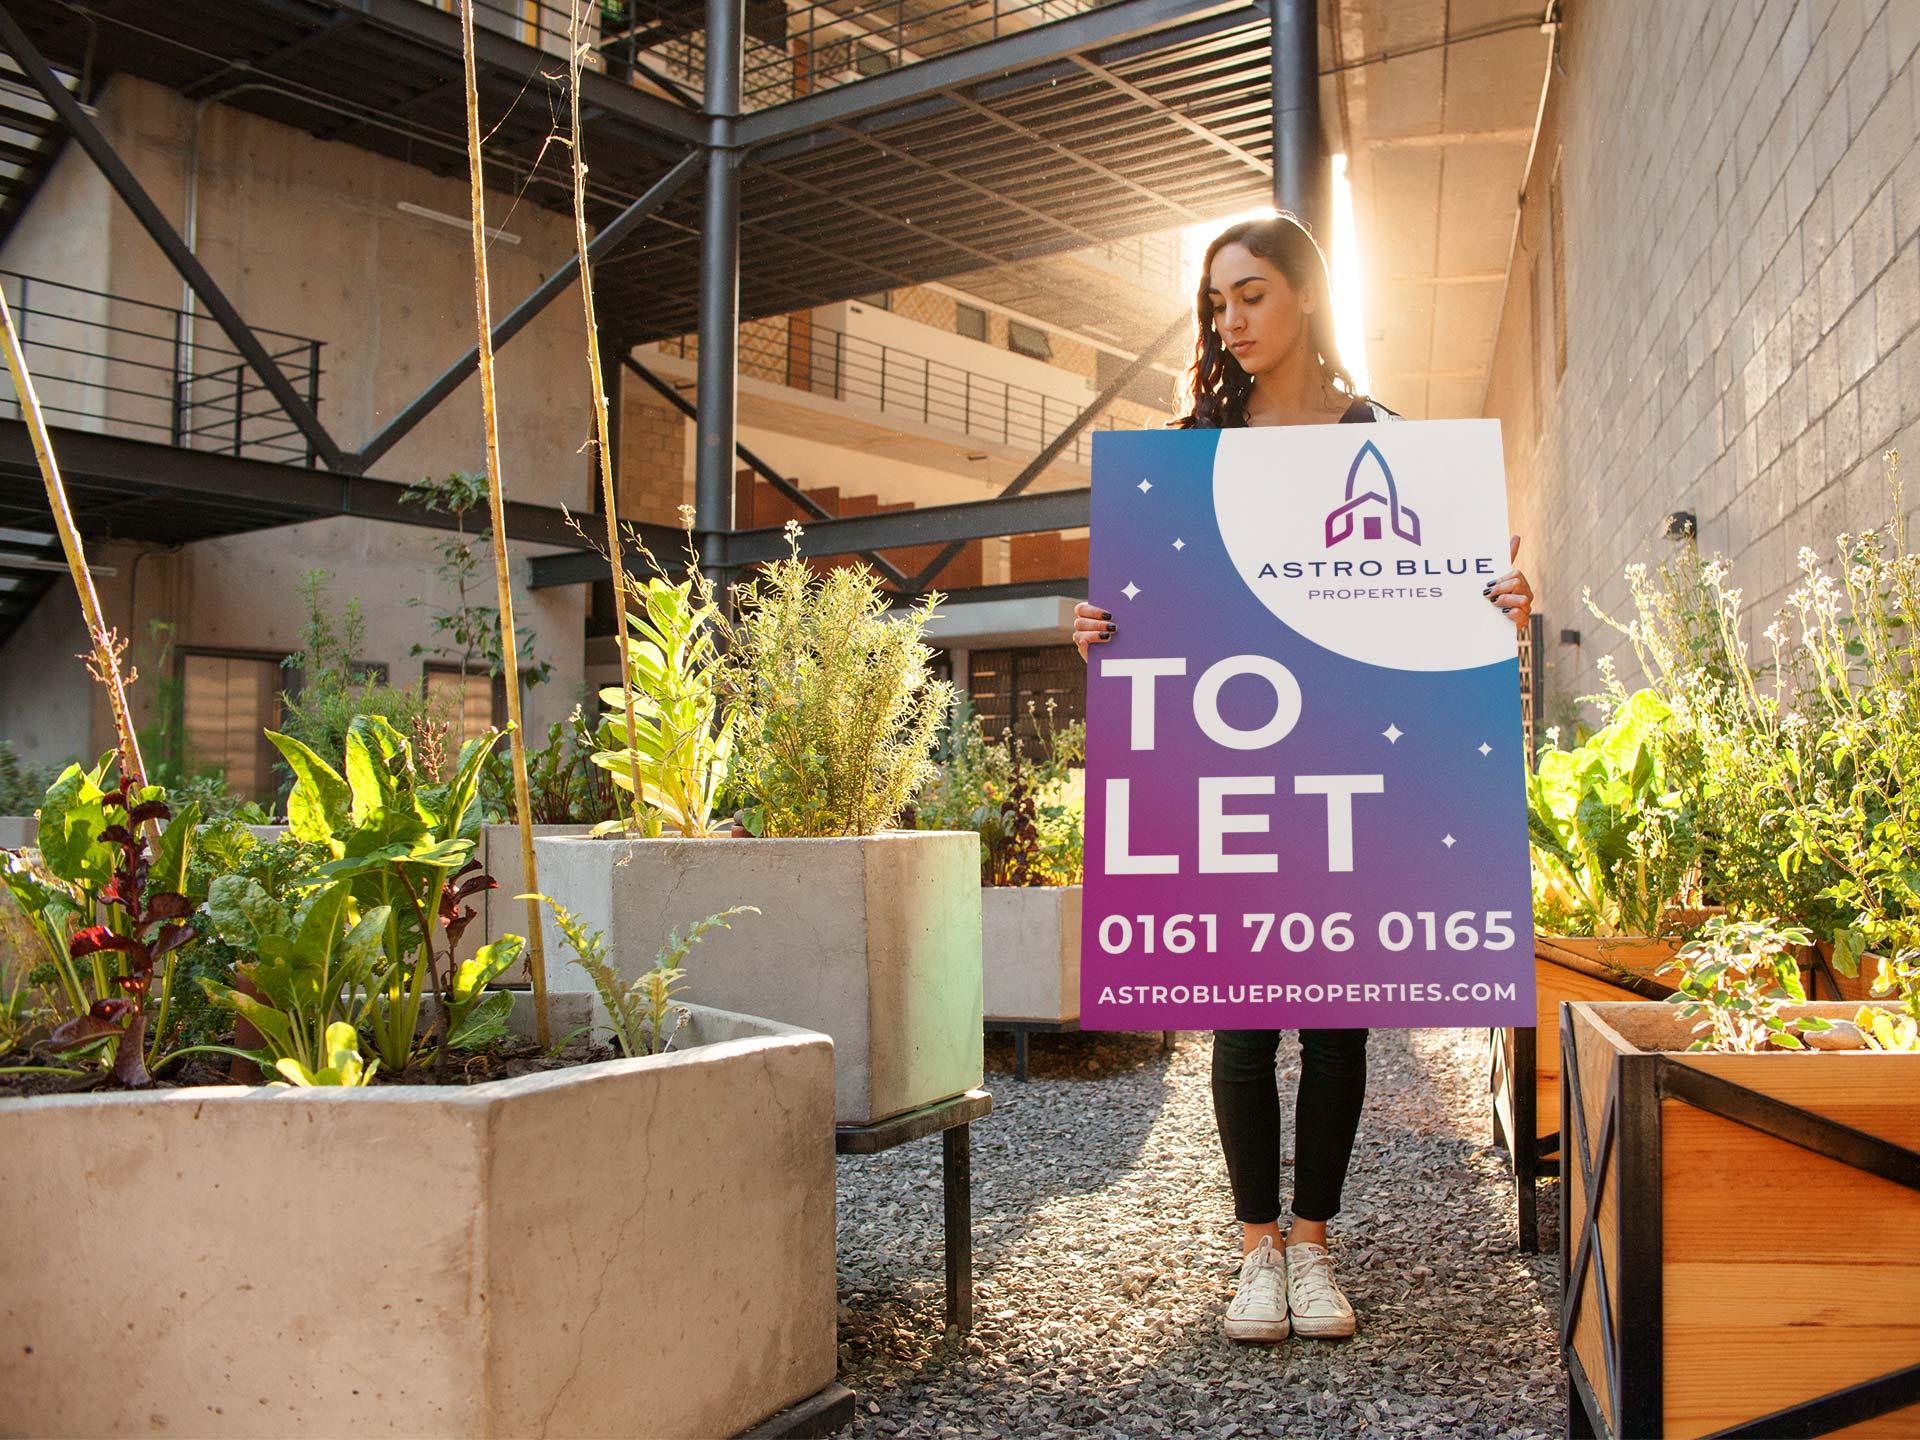 Astro Blue Estate Agent To Let Sign Design